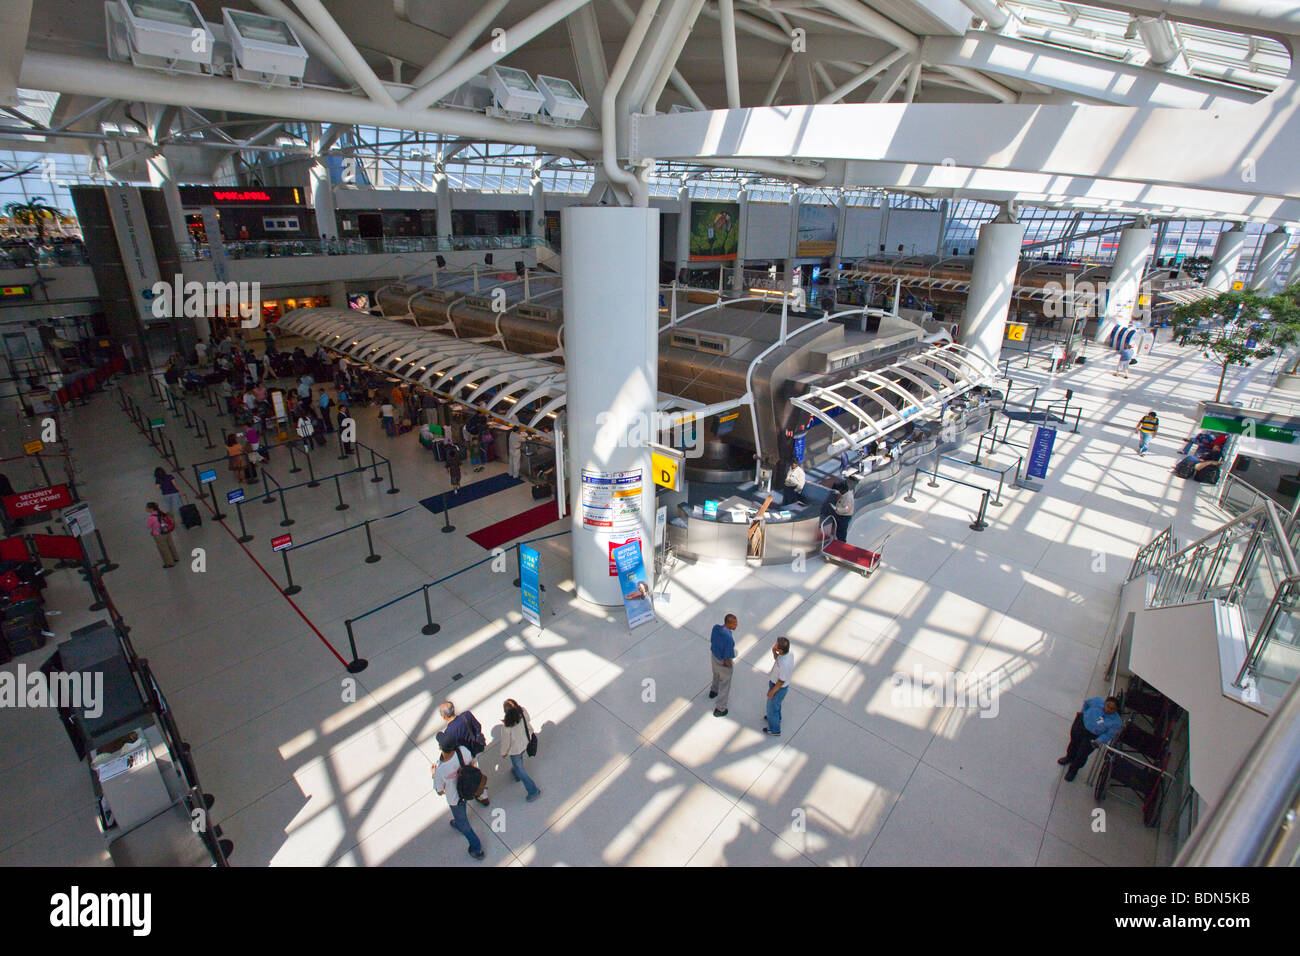 Aeroporto York : Dentro do aeroporto internacional jfk em nova york foto imagem de